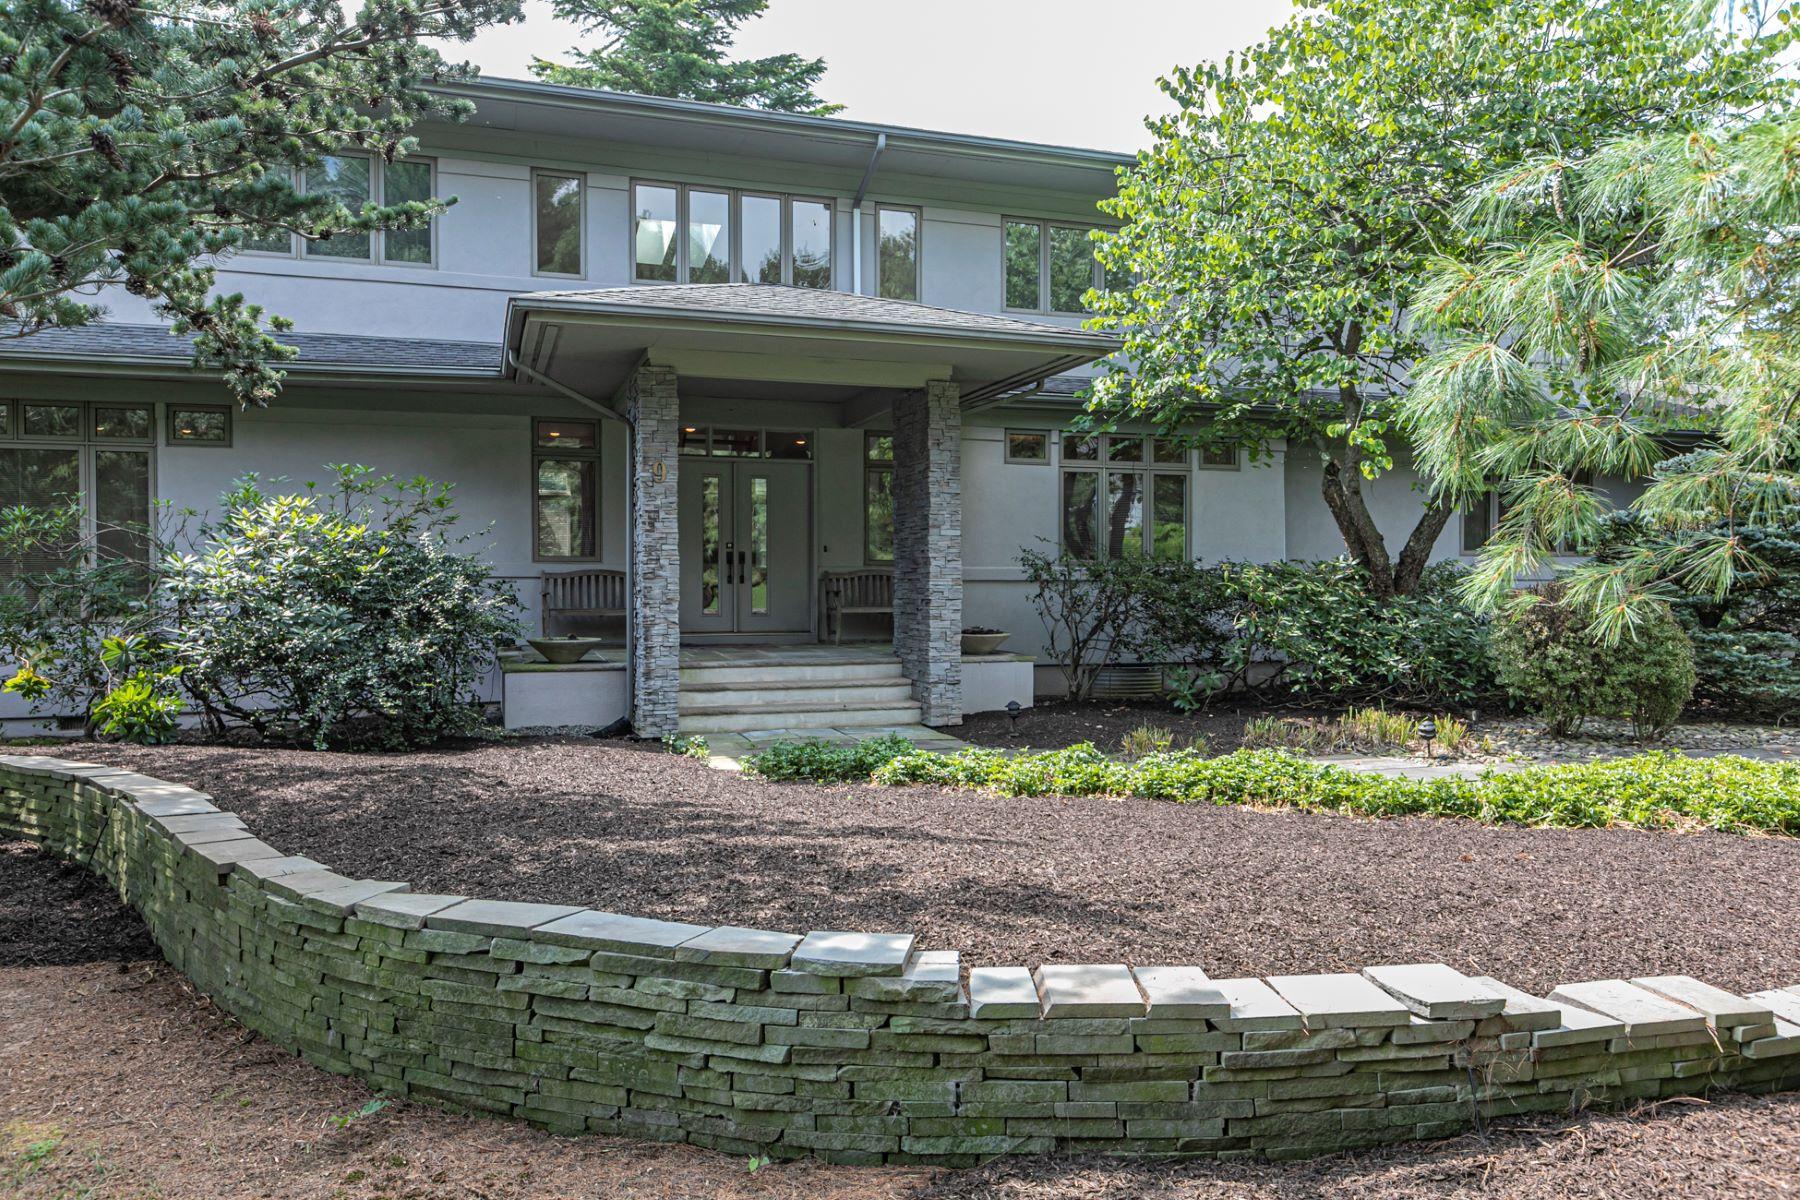 Single Family Homes για την Πώληση στο A Haven of Serenity So Close to Everything 9 Tomlyn Drive, Princeton, Νιου Τζερσεϋ 08540 Ηνωμένες Πολιτείες